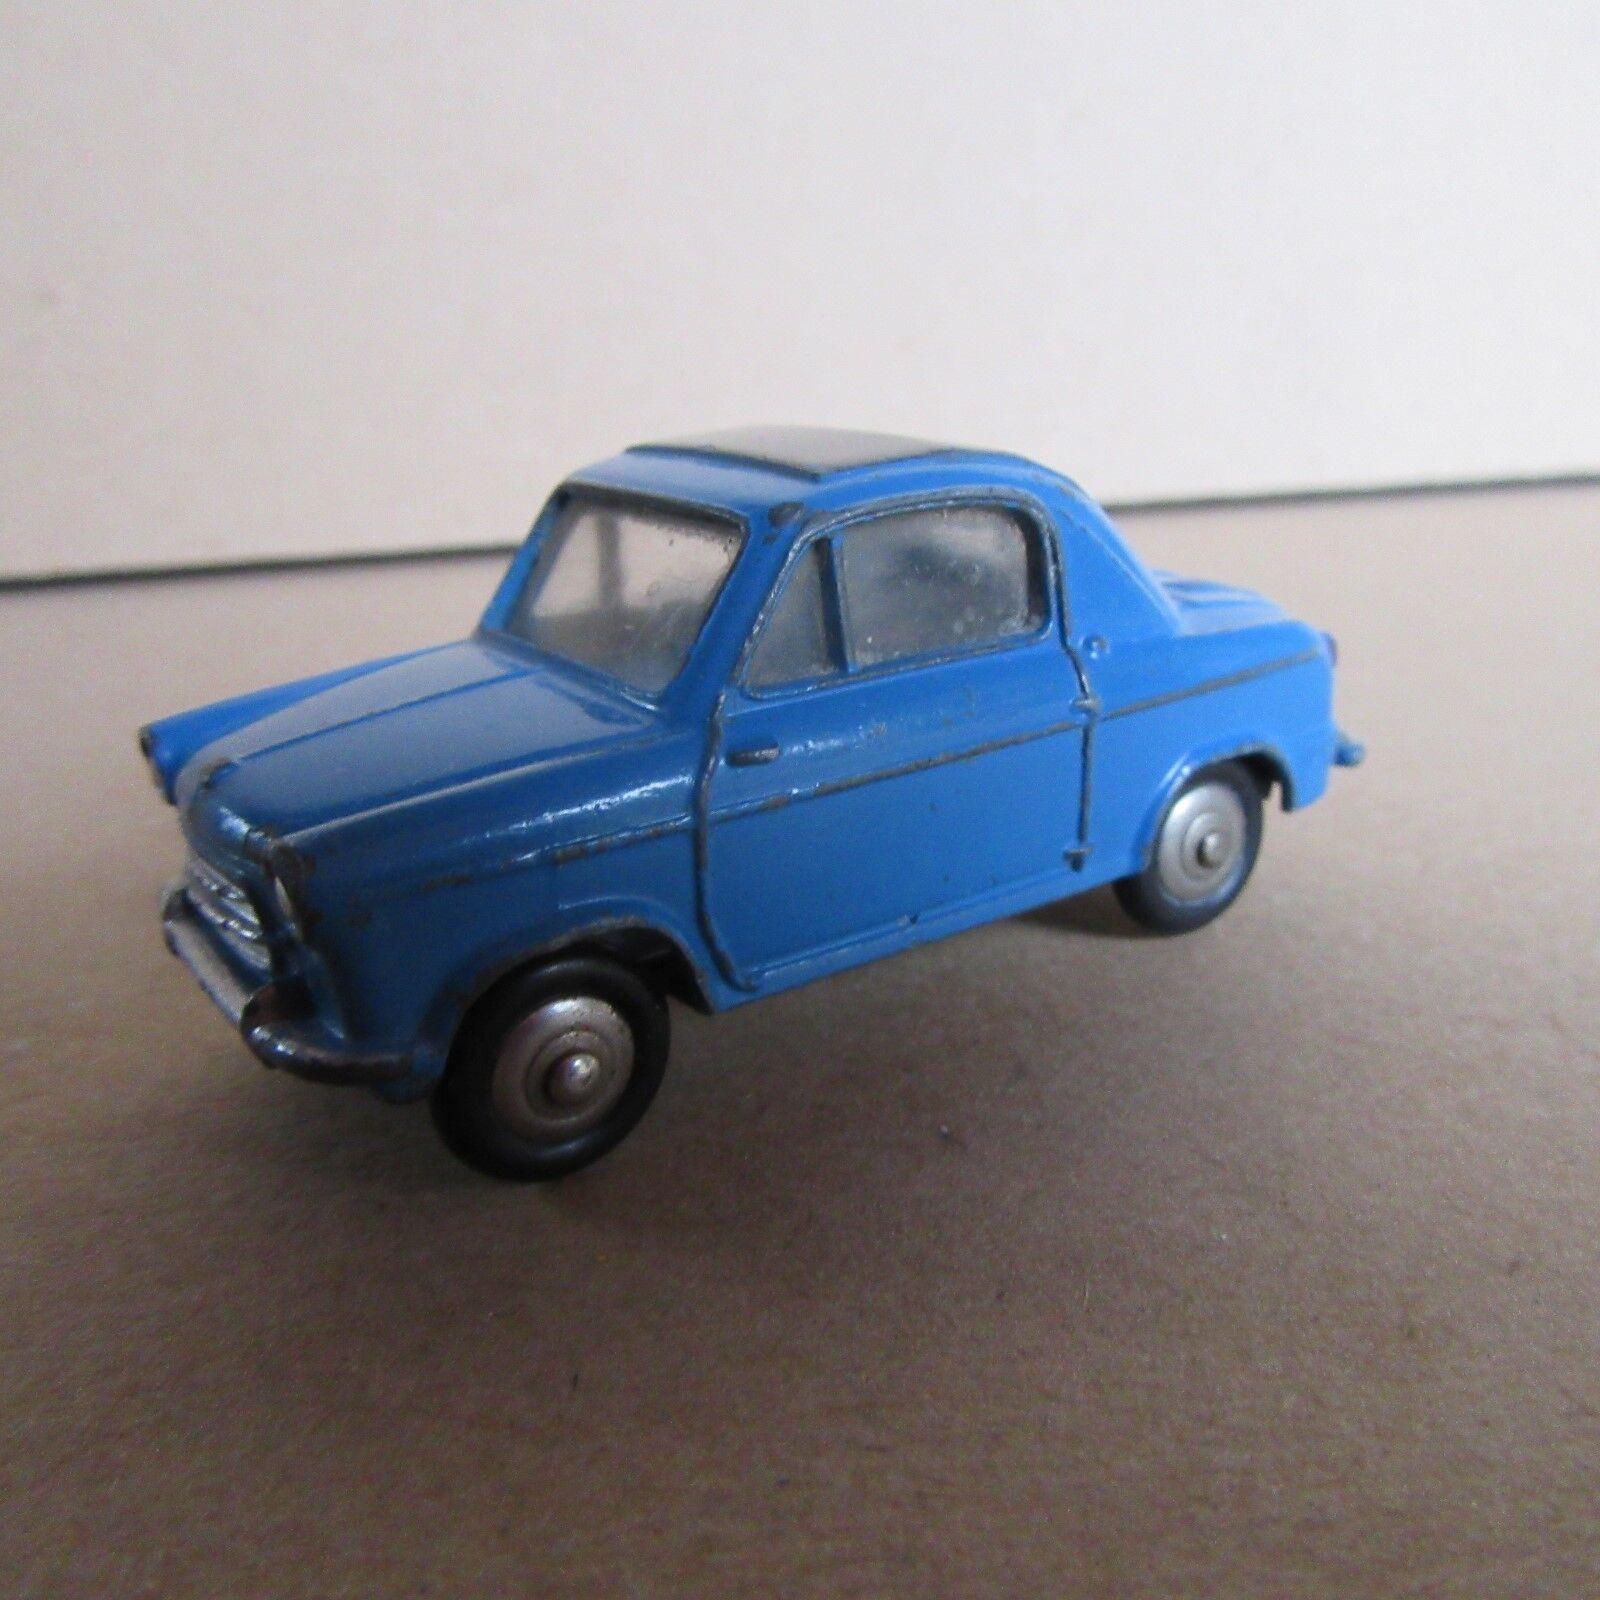 157F Vintage Dinky 24L Vespa 2cv bluee 1 43 Meccano